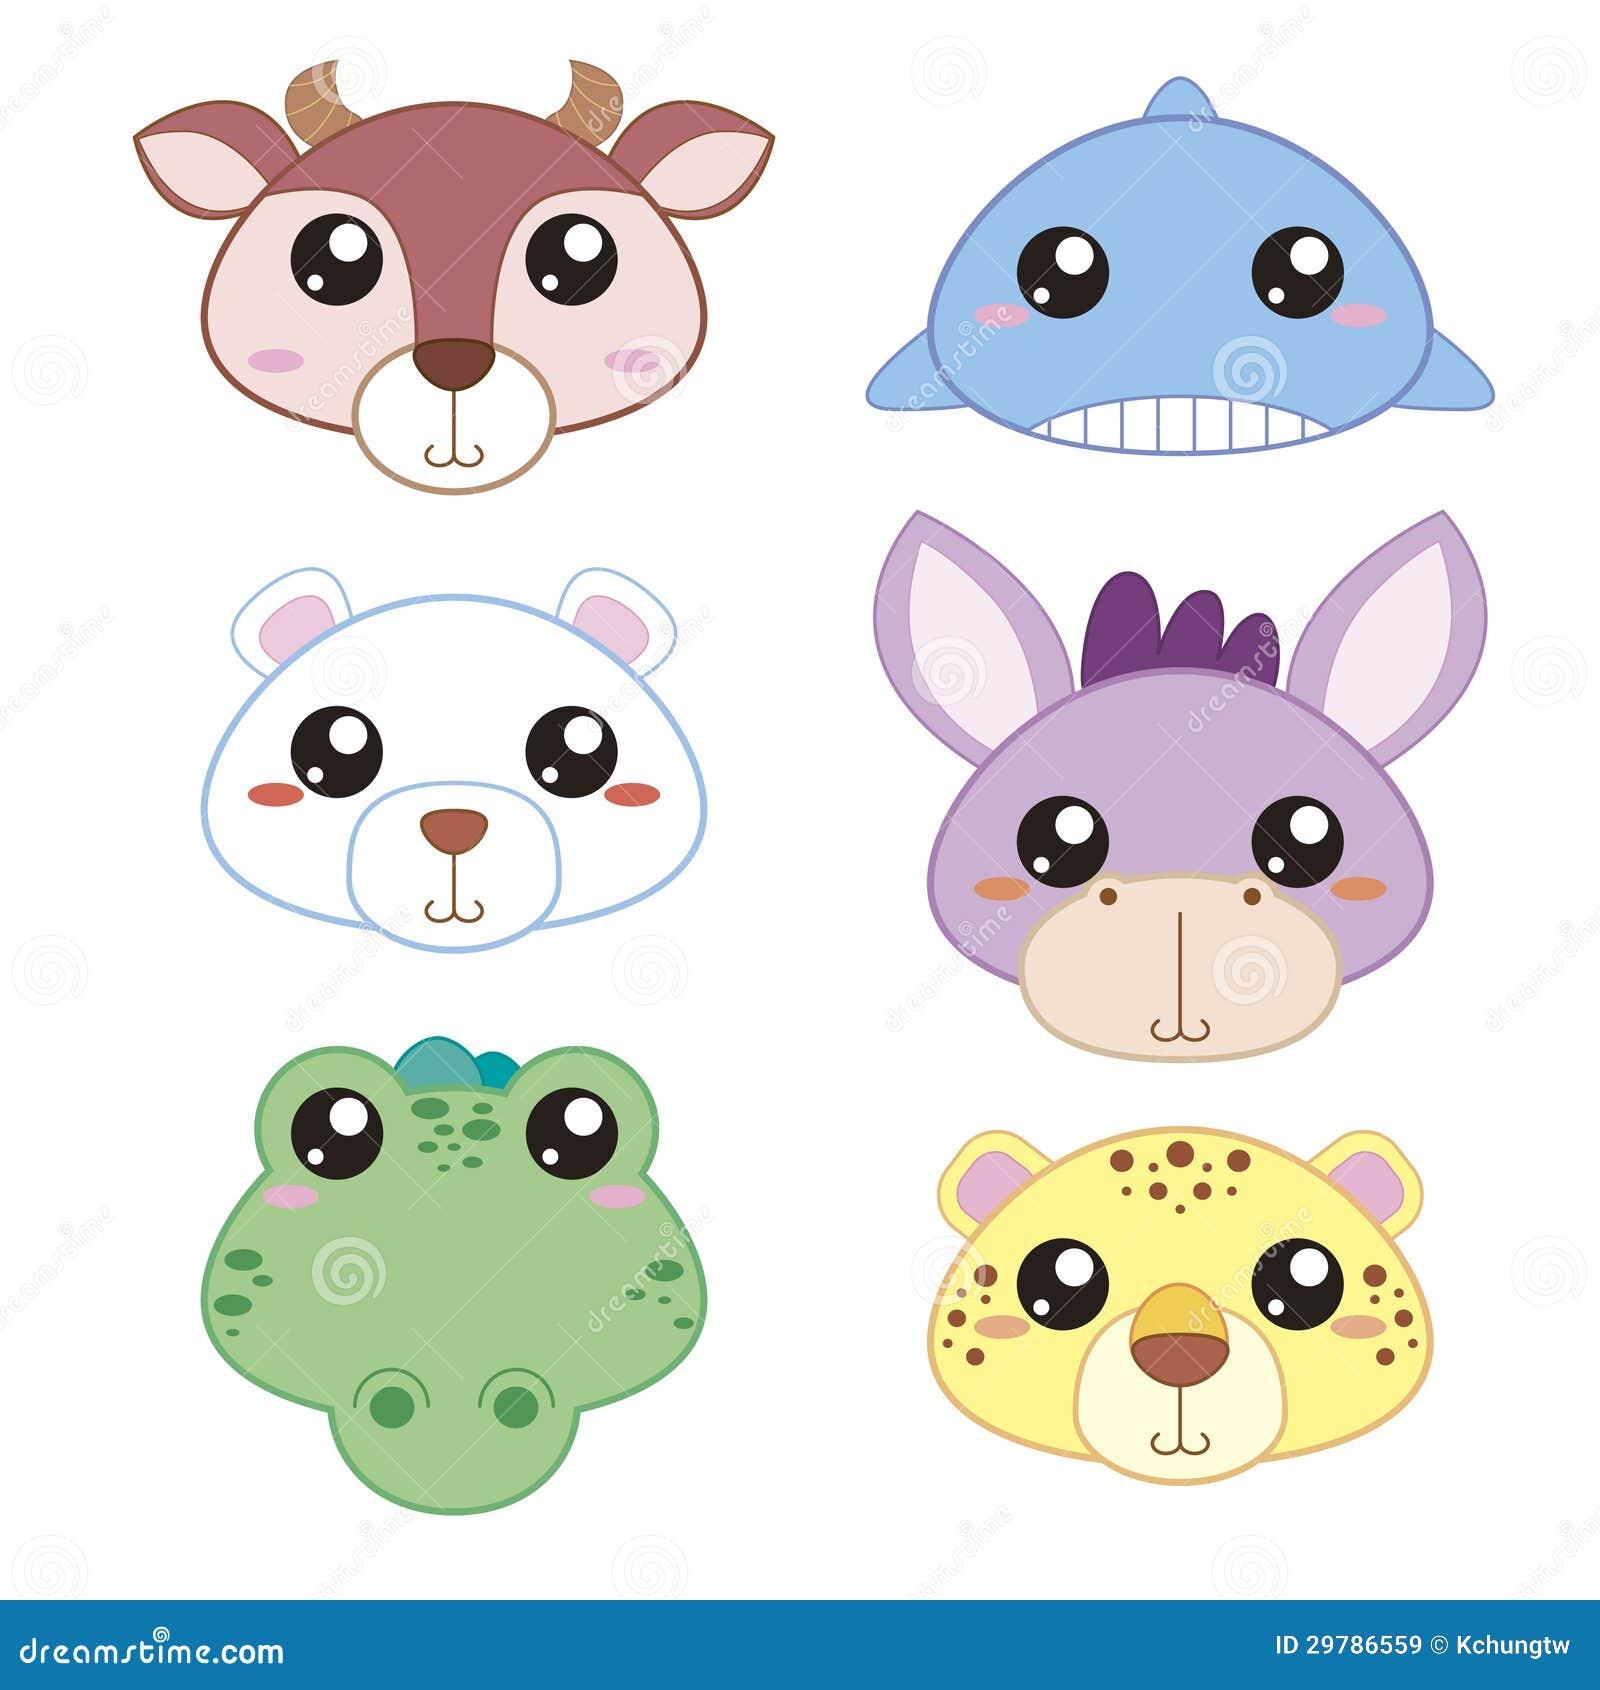 Six Cute Cartoon Animal Head Royalty Free Stock Images Image